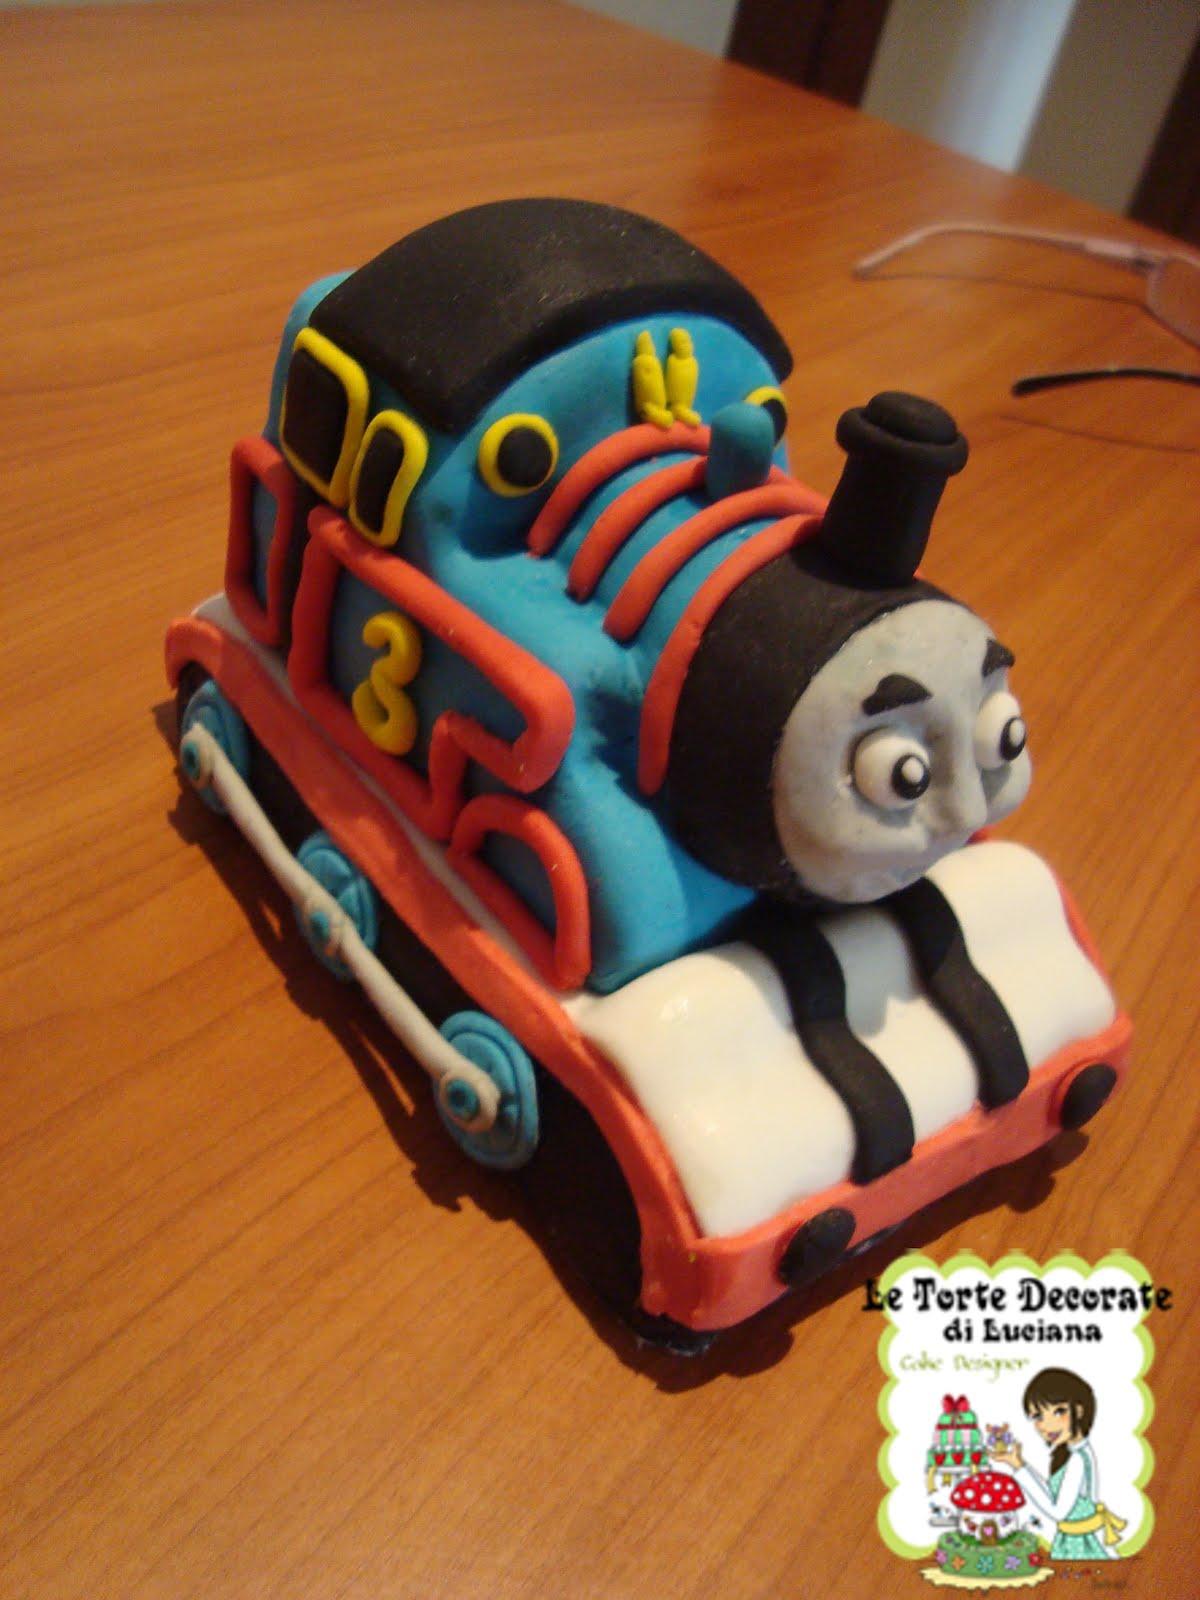 Le torte decorate cake topper trenino thomas for Decorazioni torte trenino thomas